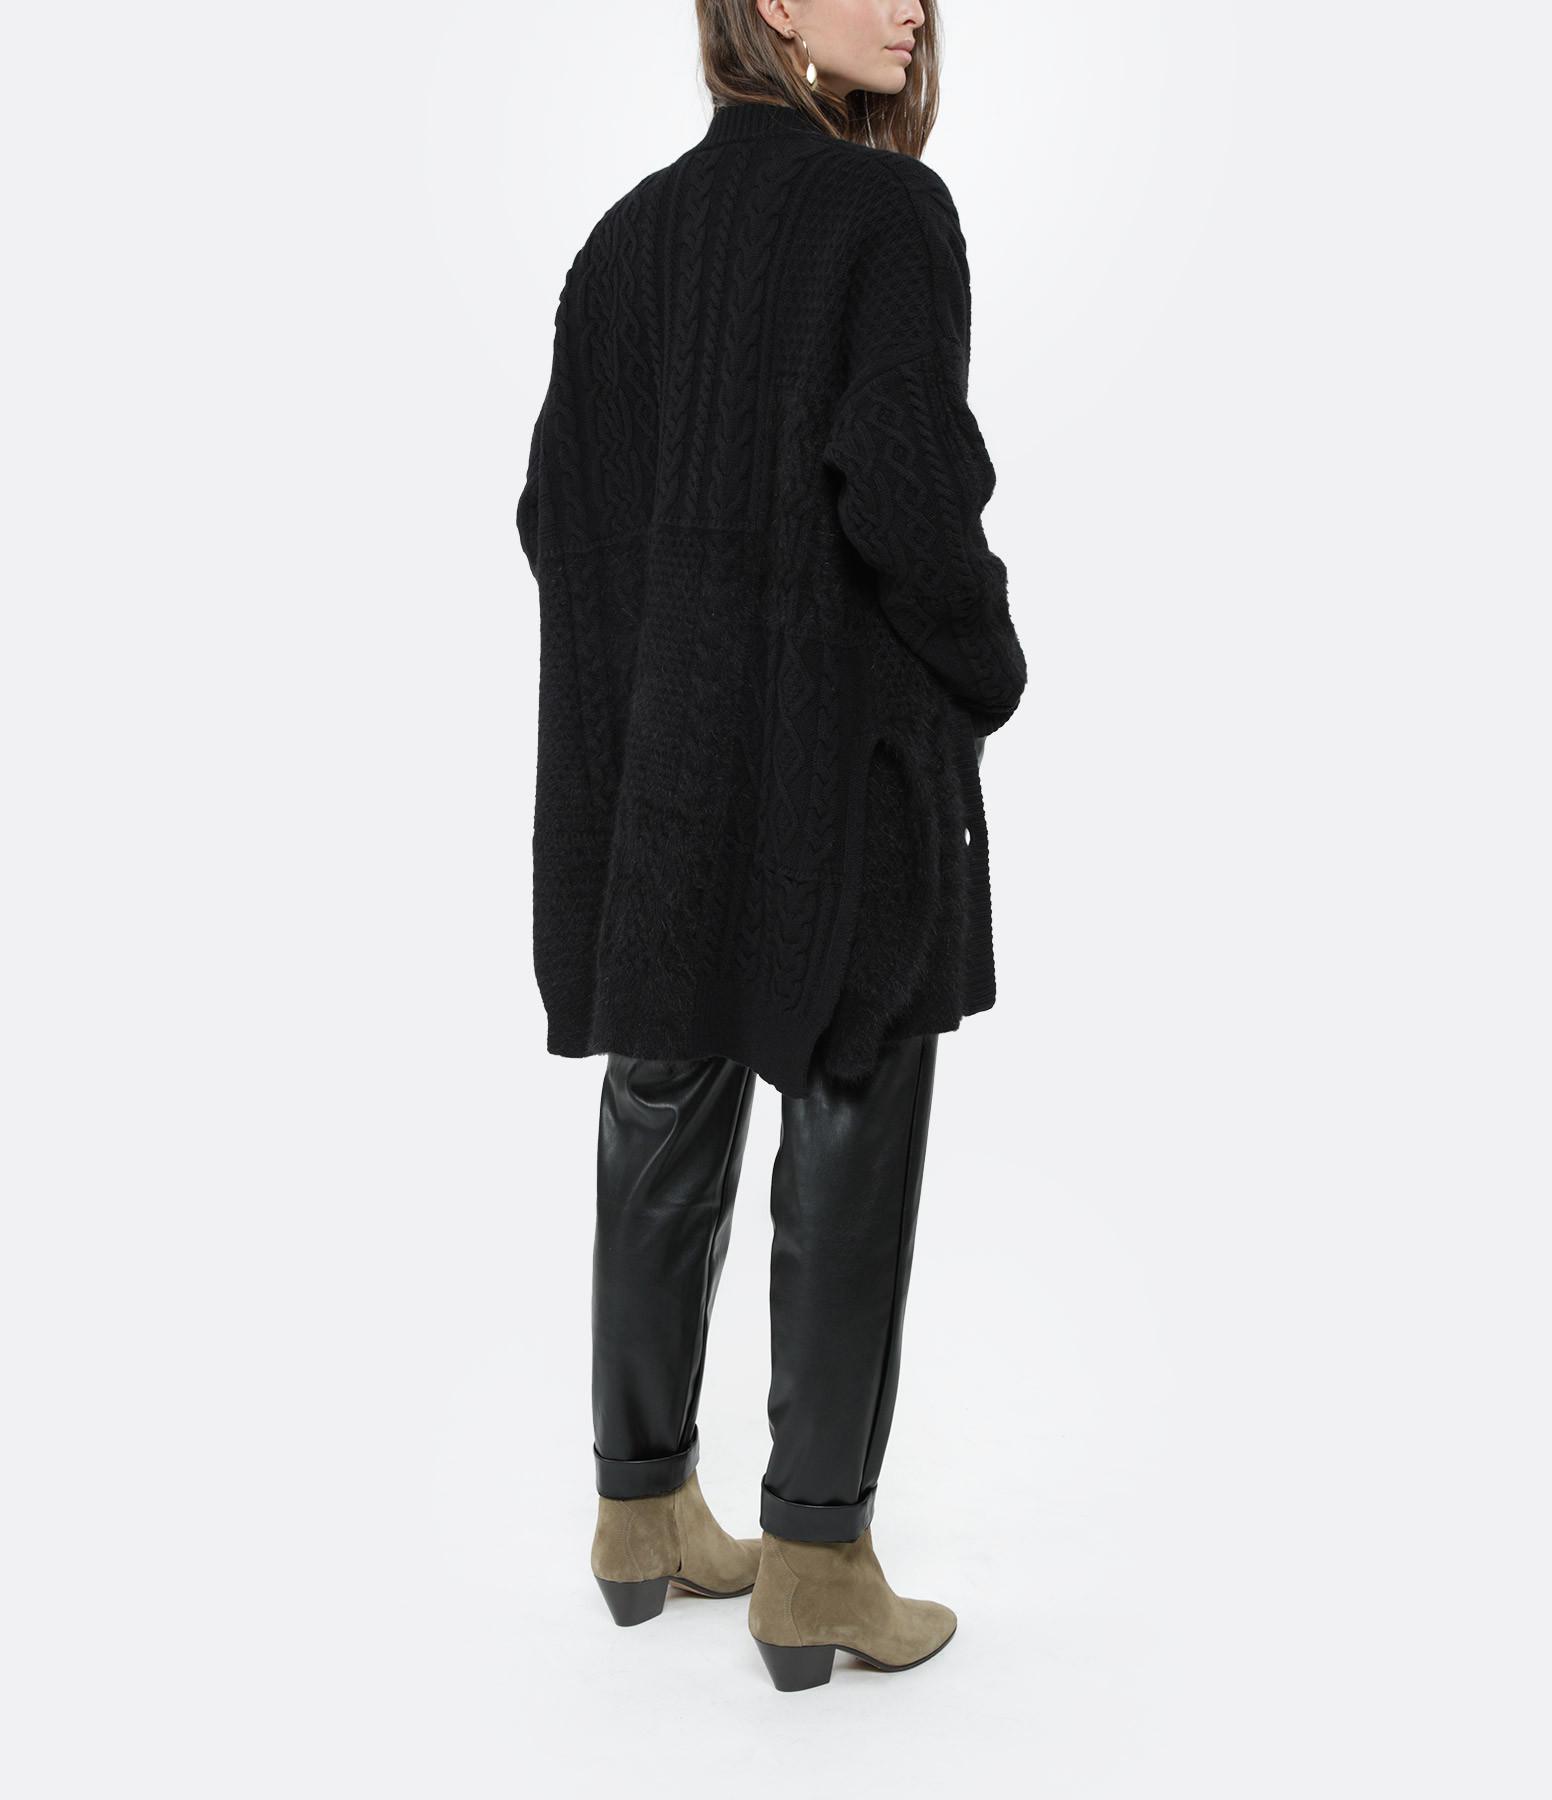 ROBERTO COLLINA - Manteau Coreana Patch Laine Noir